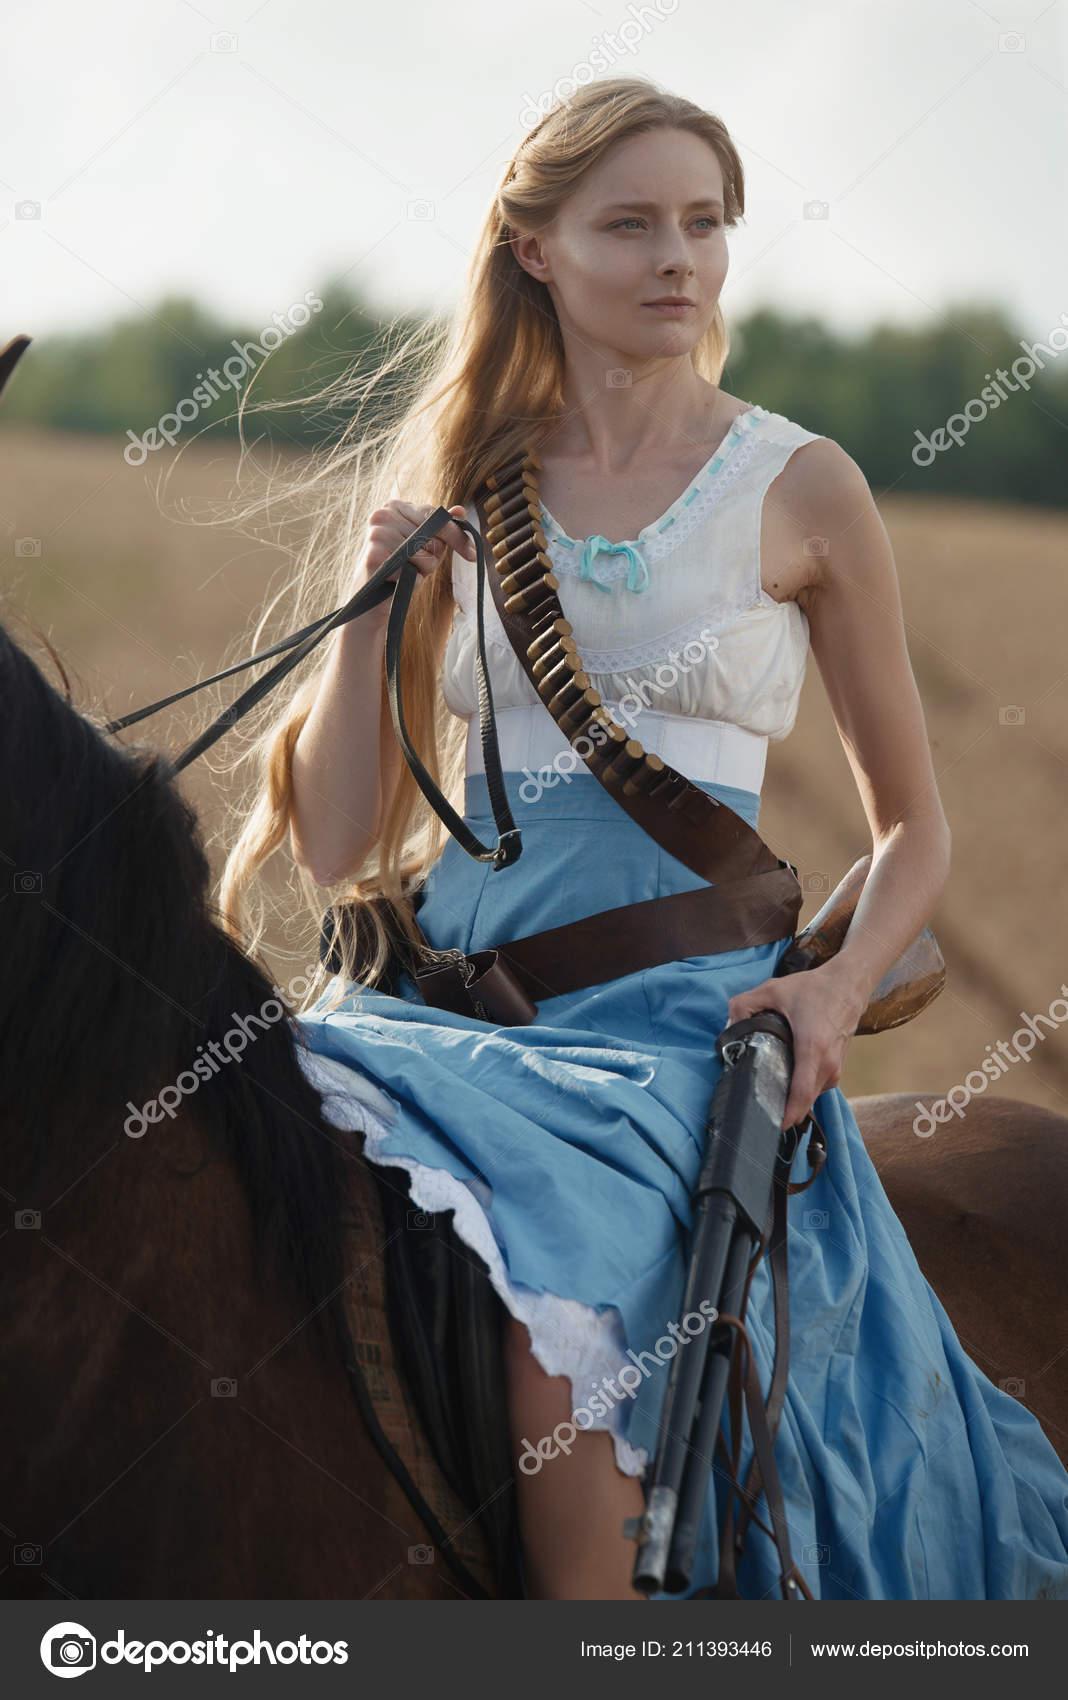 Portrait Beautiful Female Cowgirl Shotgun Wild West Riding Horse Outback Stock Photo C Artyme 211393446